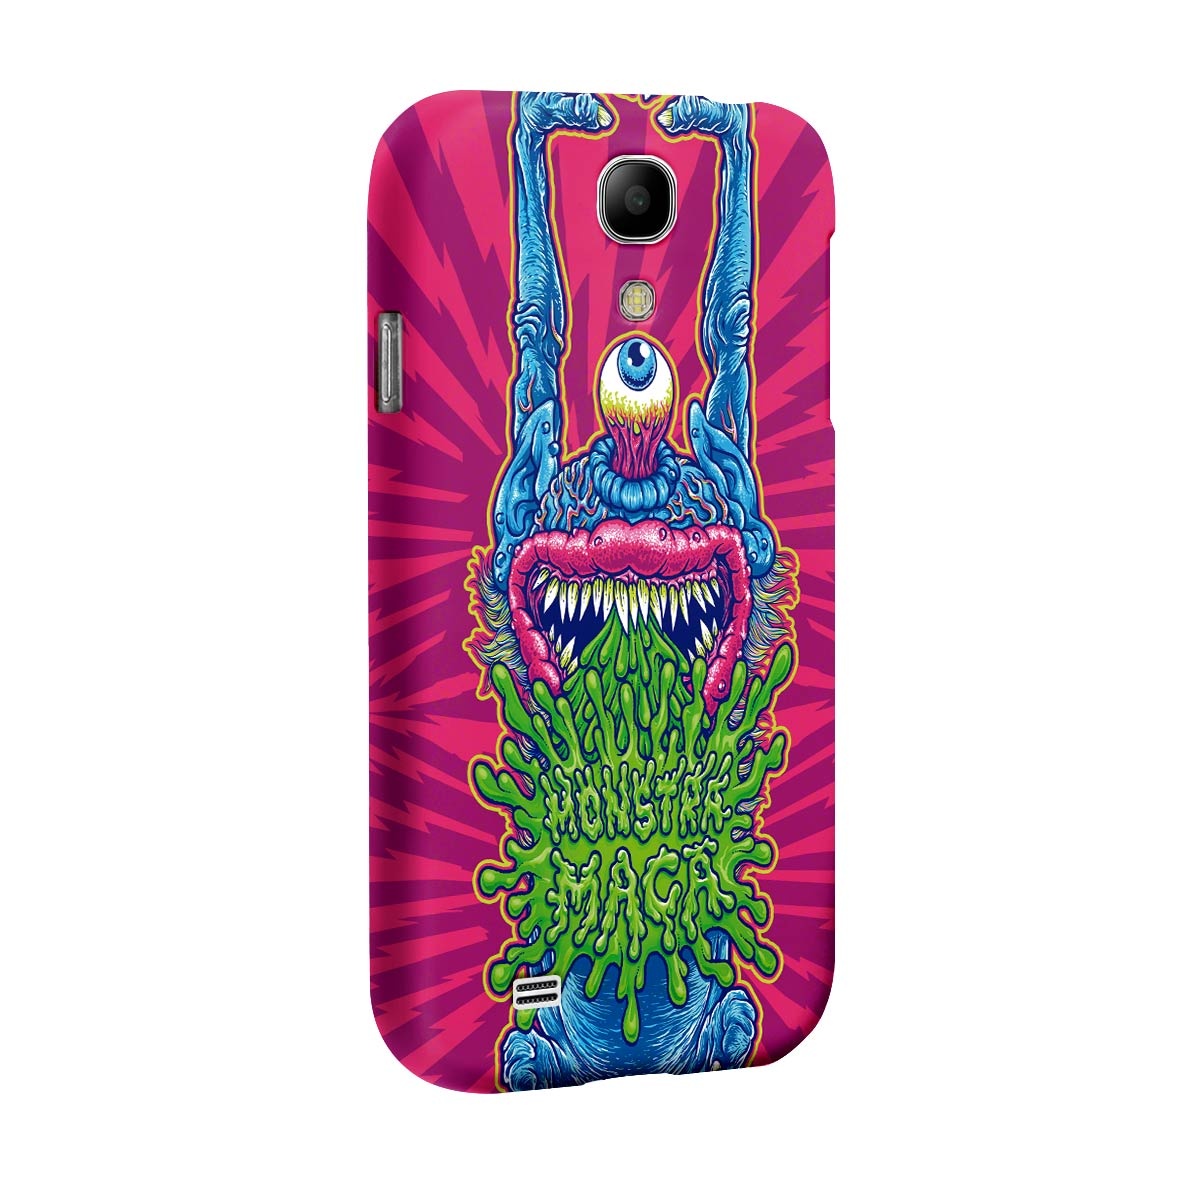 Capa para Samsung Galaxy S4 Monstra Maçã Puke